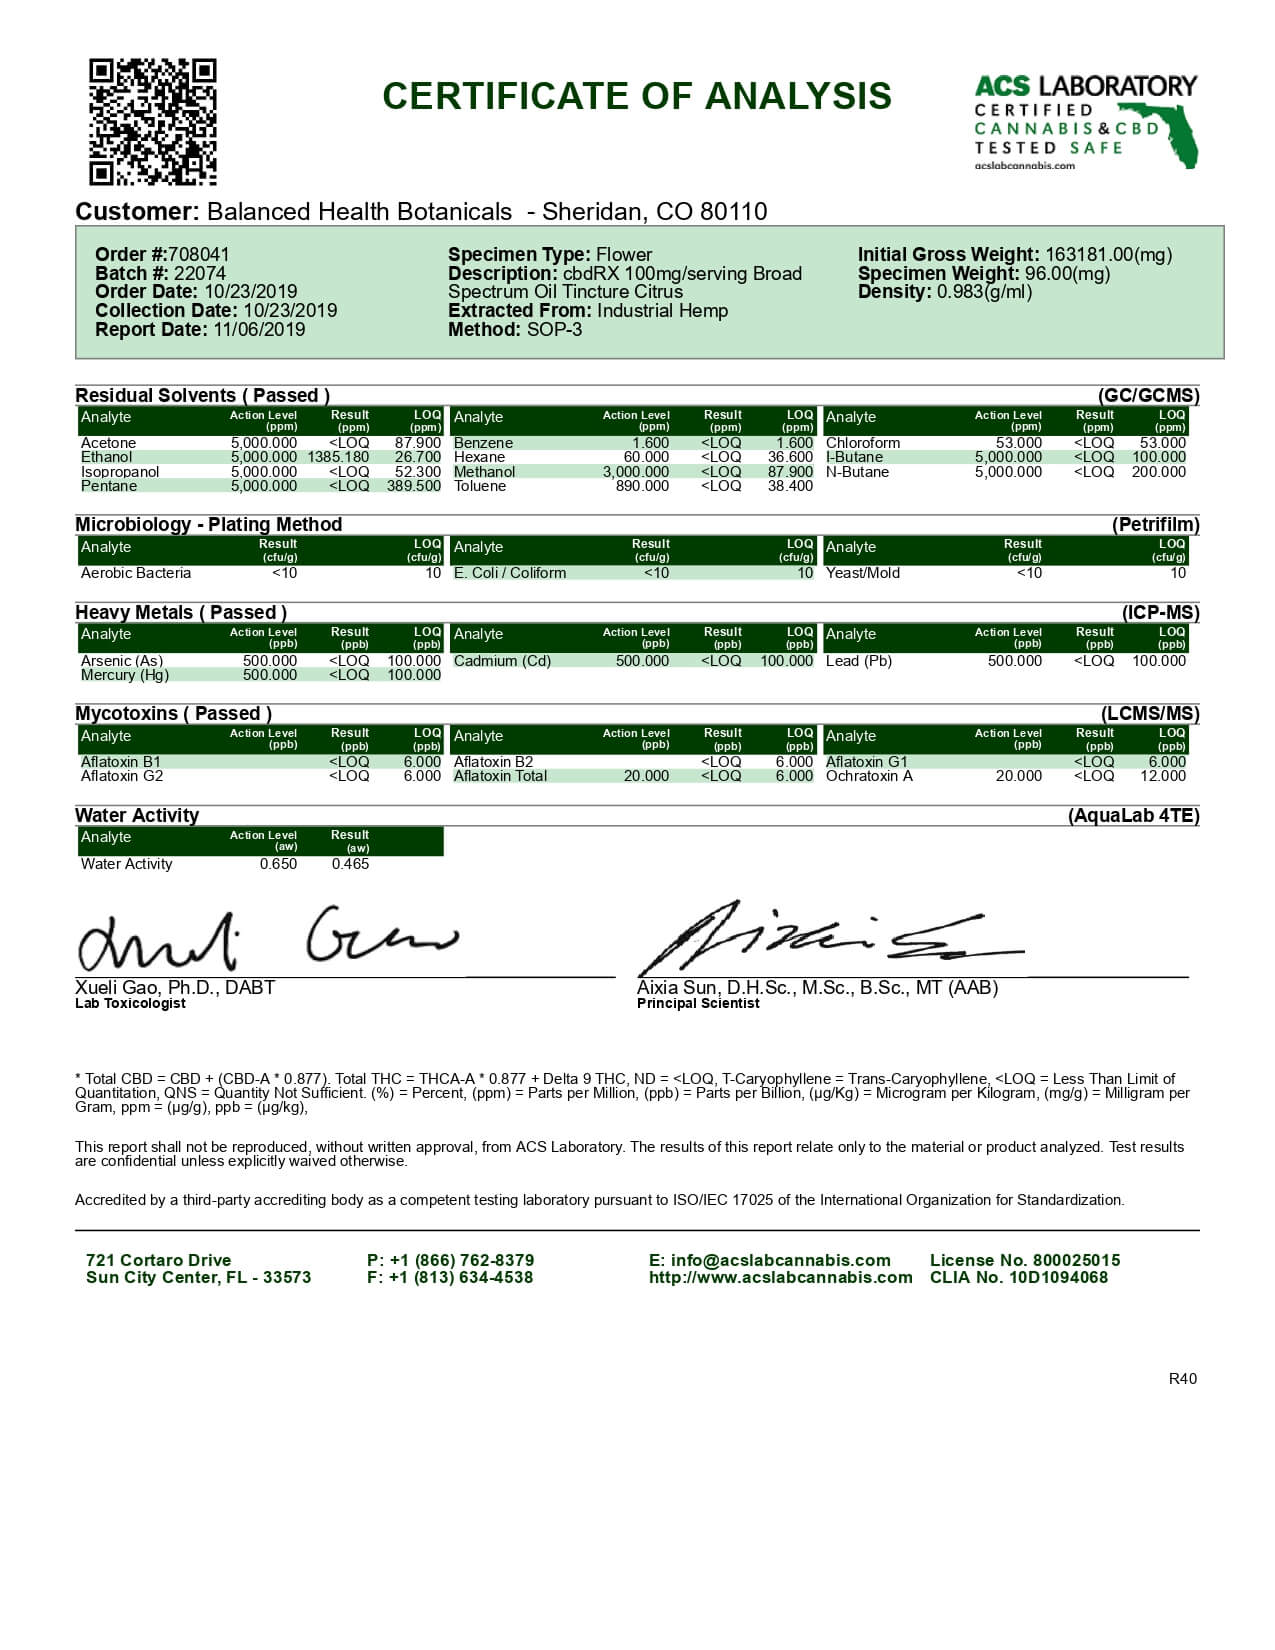 CBDistillery Rx CBD Tincture Broad Spectrum Citrus 3000mg Lab Report